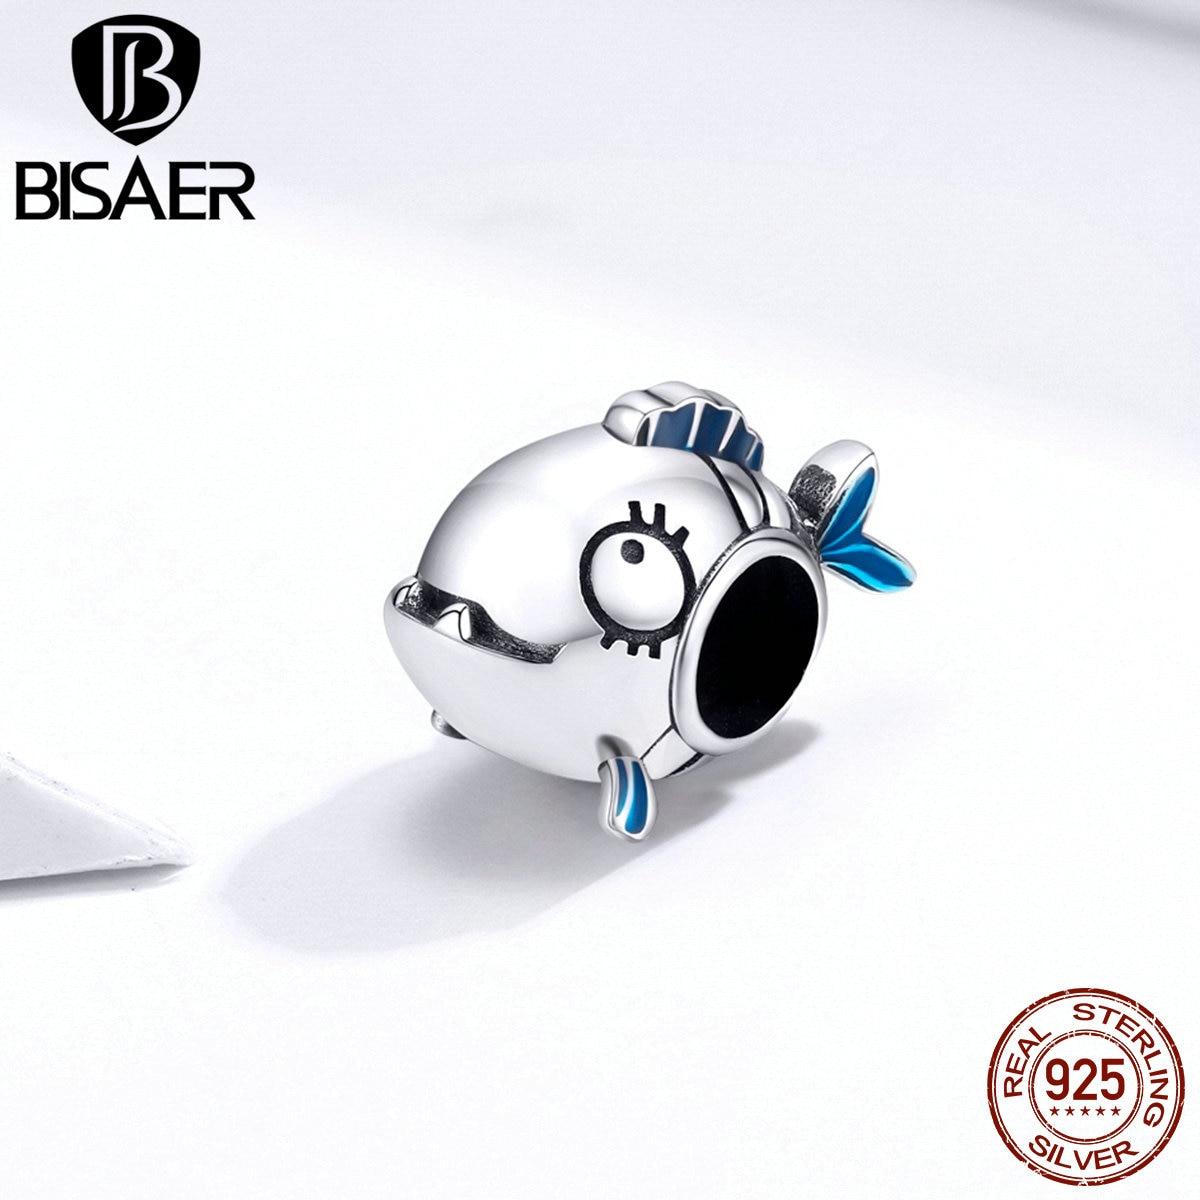 BISAER Ocean Fish Charms 925 Sterling Silver 3D Design Fish Bead Pendant fit Original Bracelets DIY Necklace Jewelry ECC1476